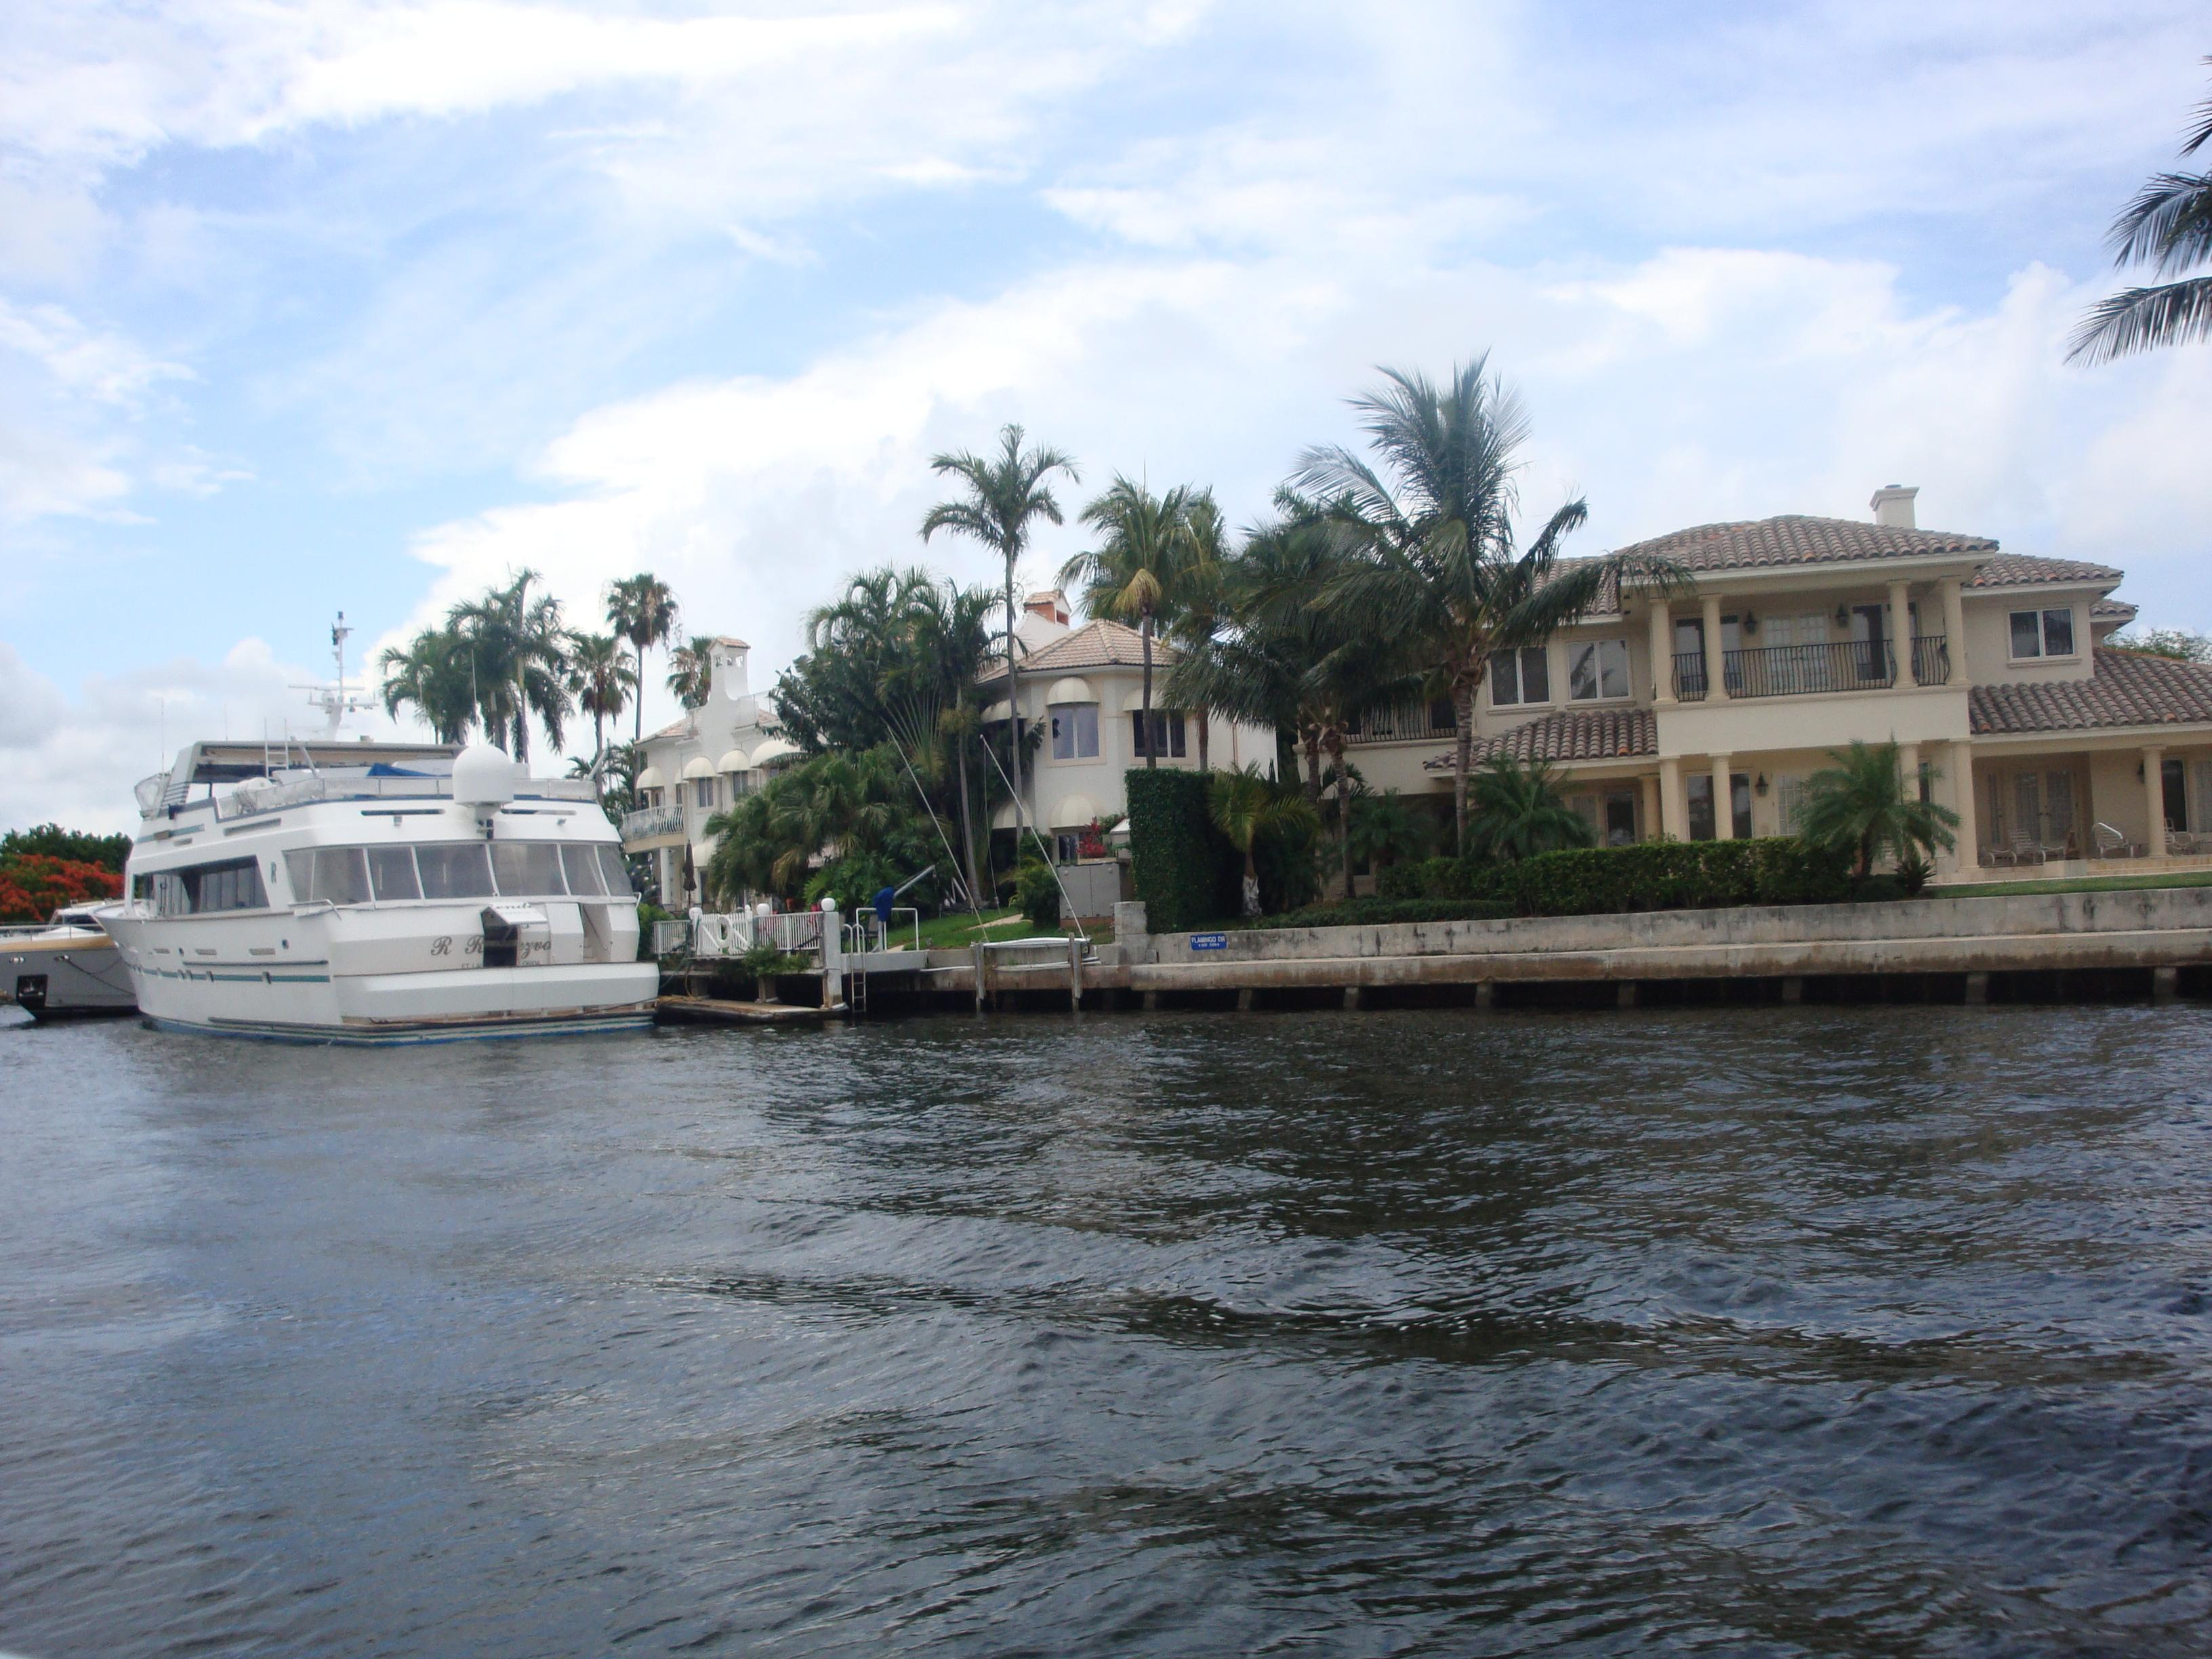 10.-Fort Lauderdale: las mansiones y sus yates I